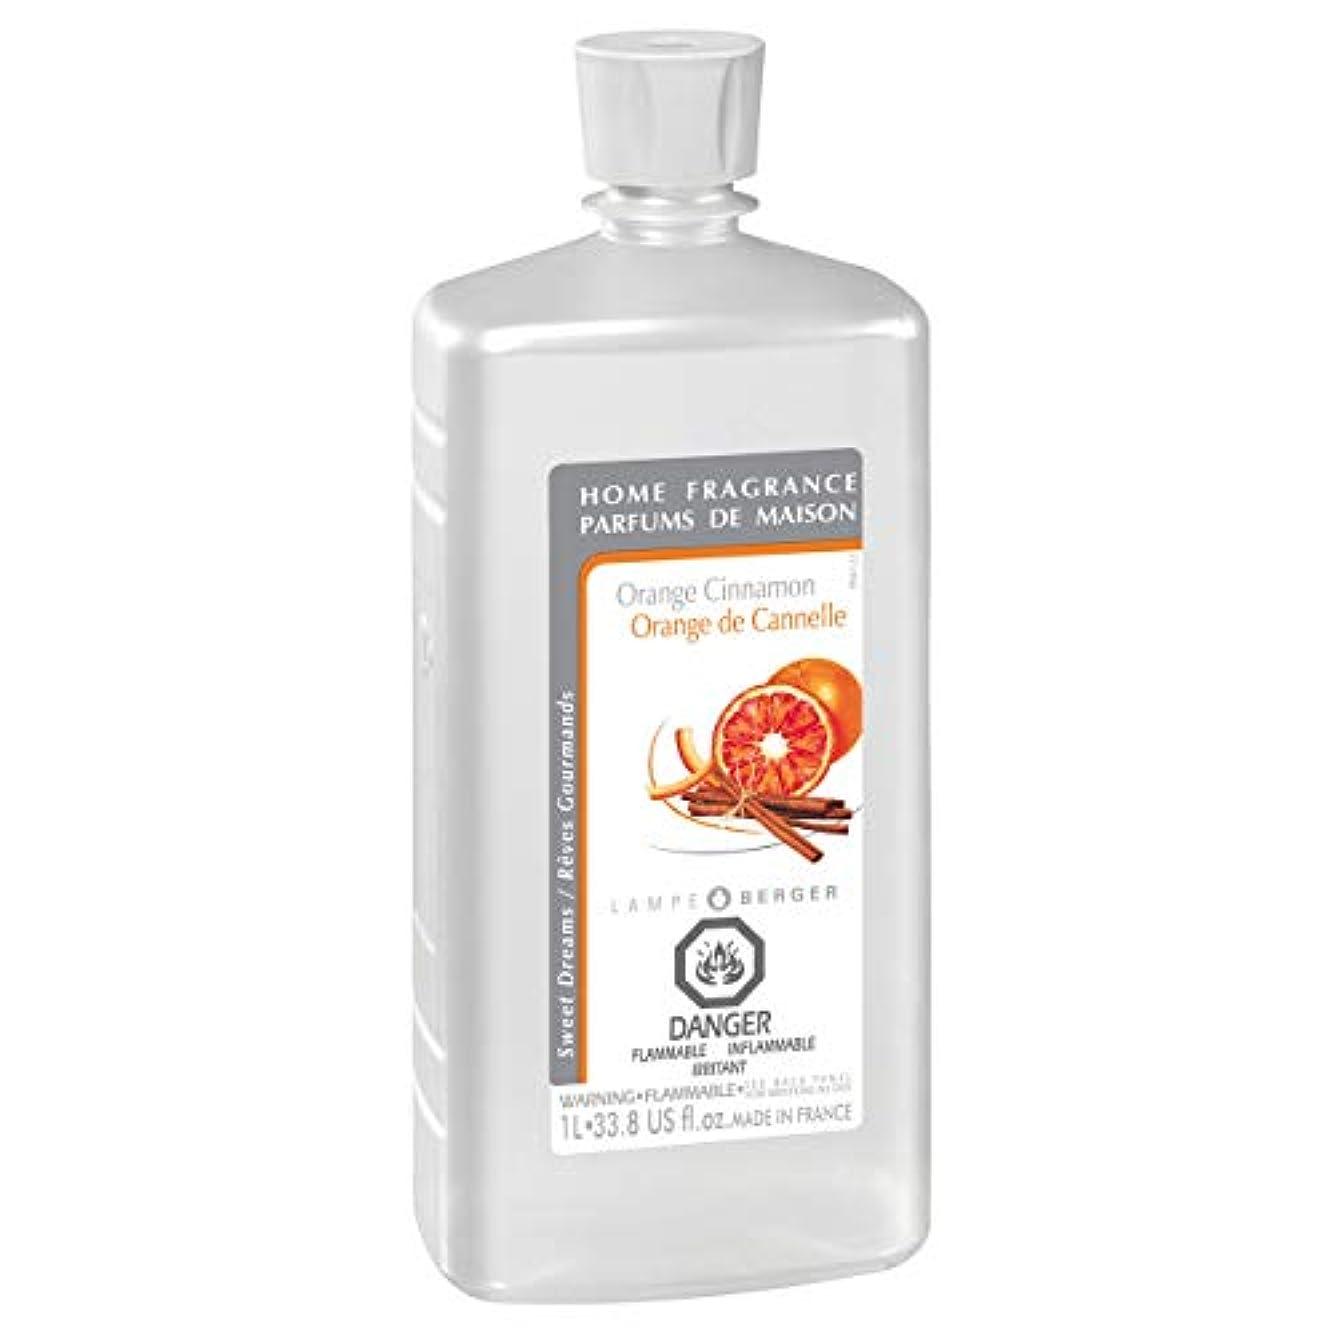 Lampe Berger Fragrance, 33.8 Fluid Ounce, Orange Cinnamon by Lampe Berger